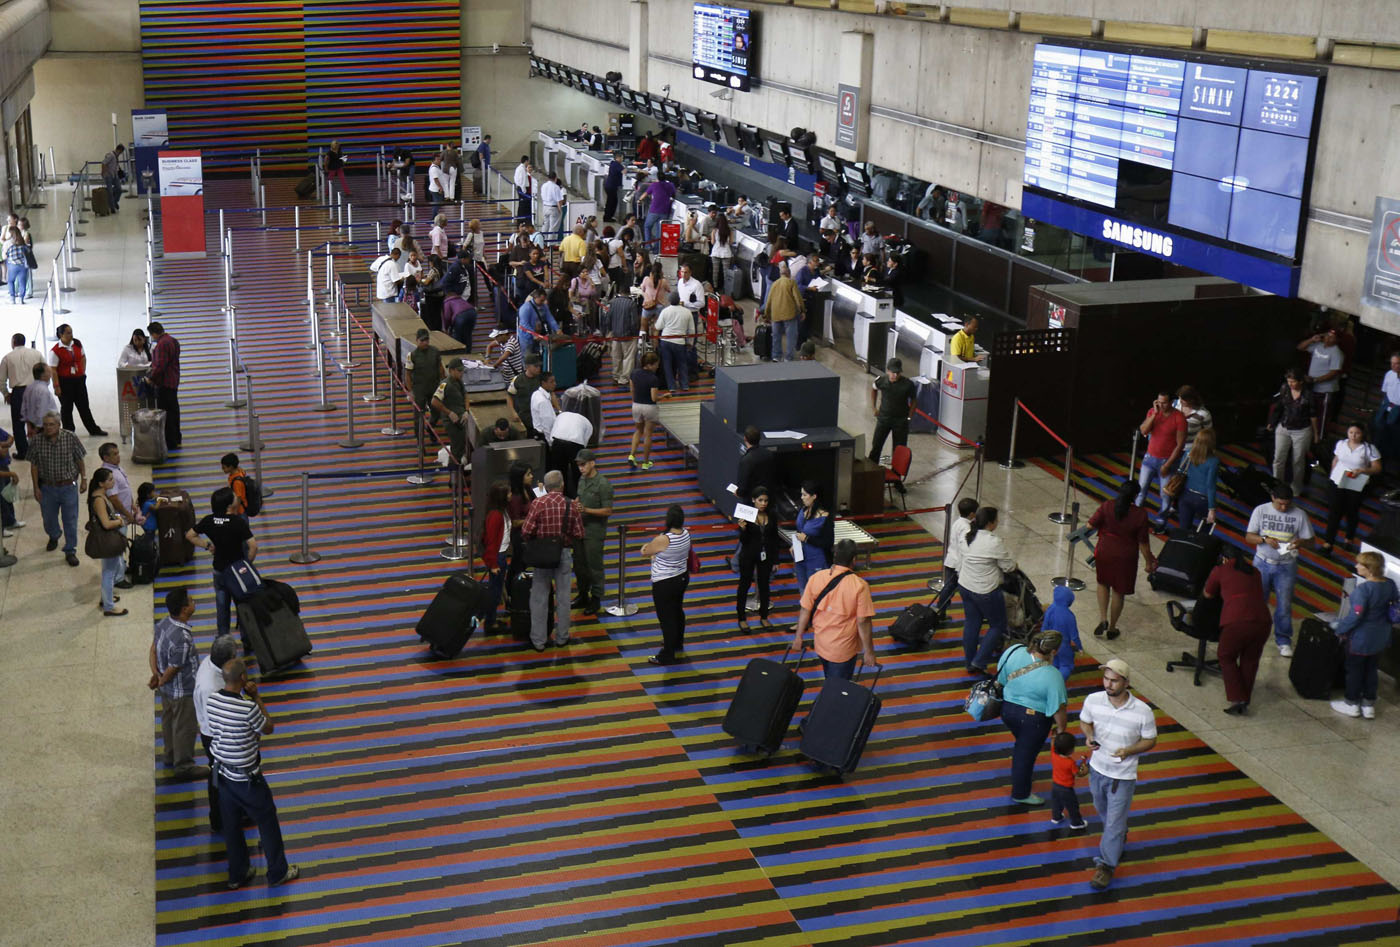 Passengers walk at the Simon Bolivar airport in La Guaira, outside Caracas September 23, 2013.  Picture taken on September 23, 2013. REUTERS/Carlos Garcia Rawlins (VENEZUELA - Tags: TRANSPORT POLITICS BUSINESS)